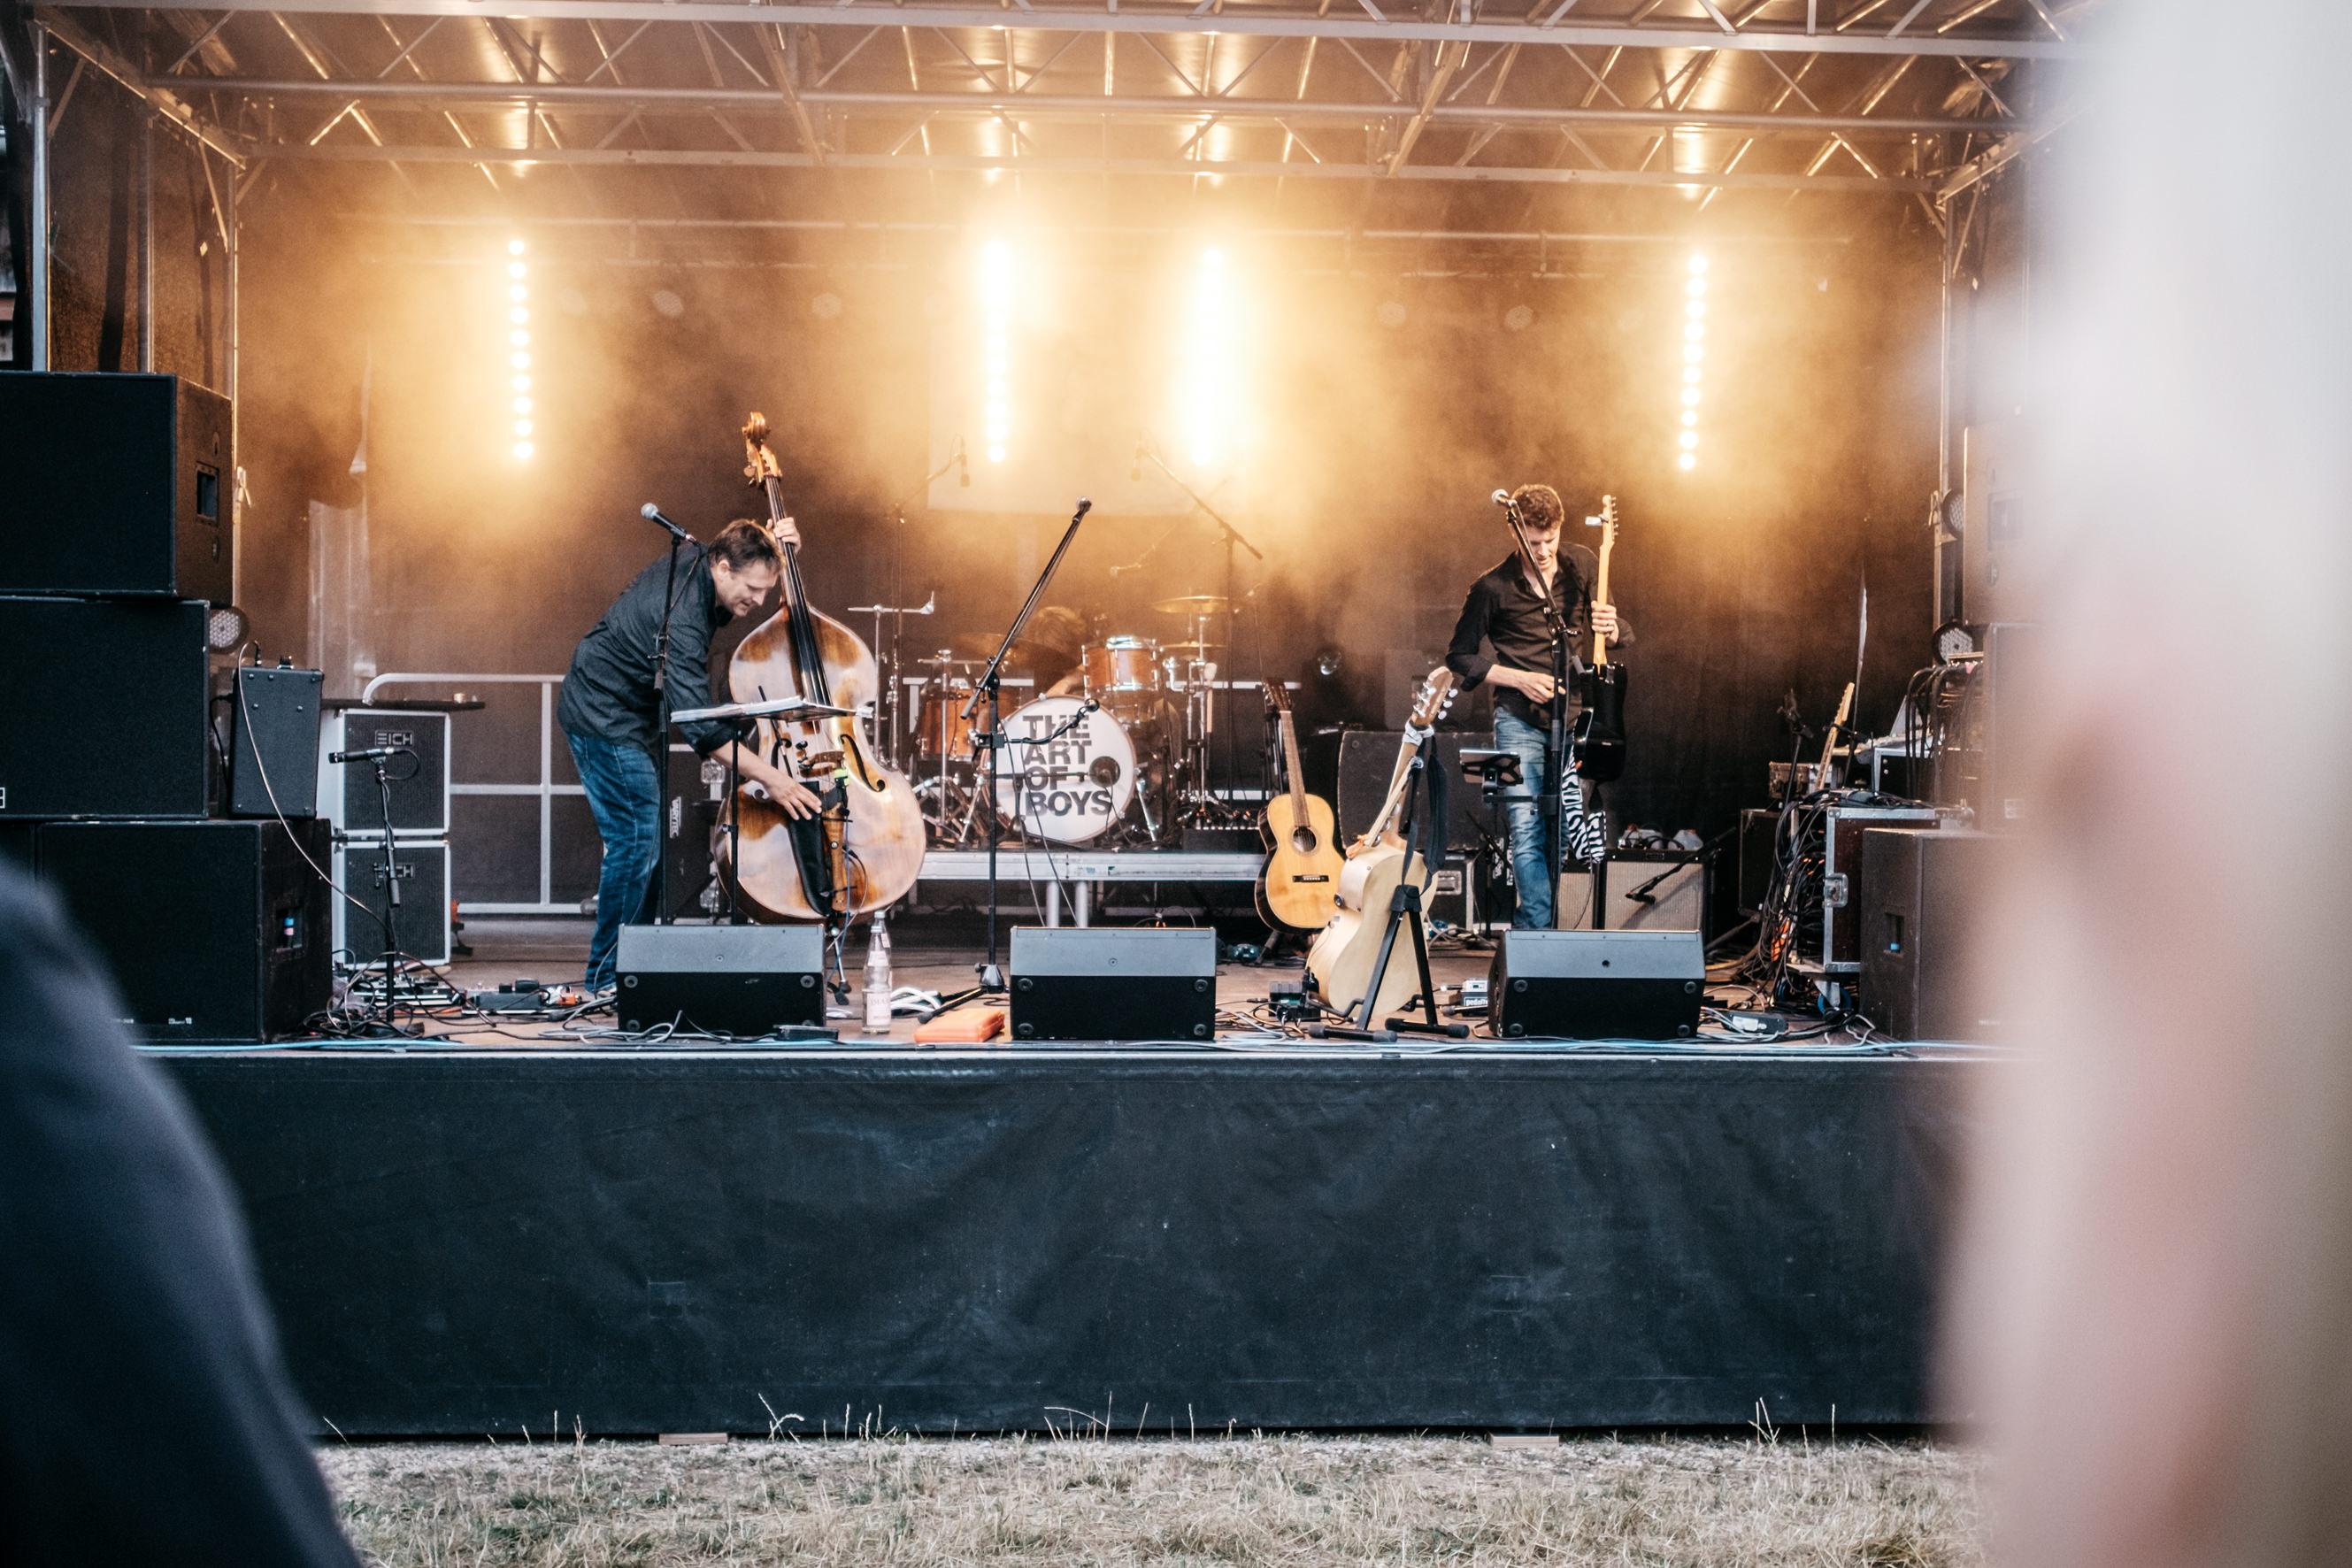 190720_Rock im Reitstall 2019-08